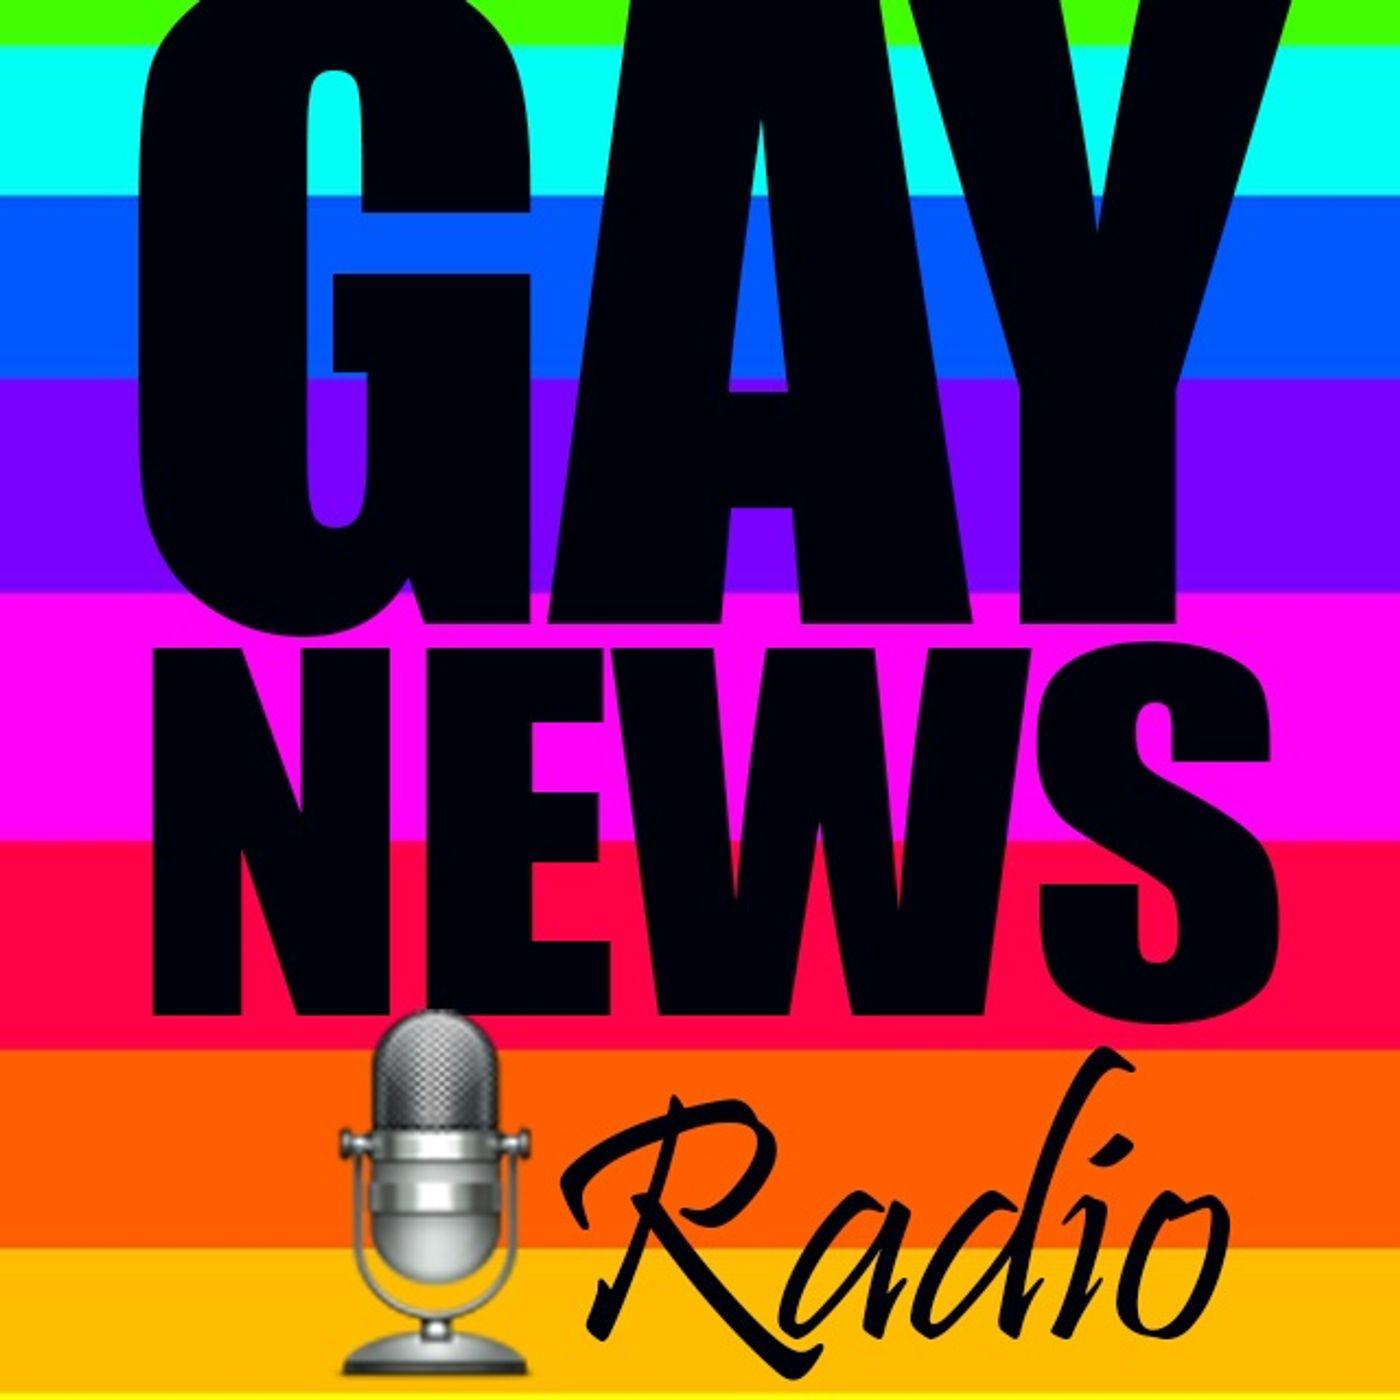 GAY NEWS RADIO